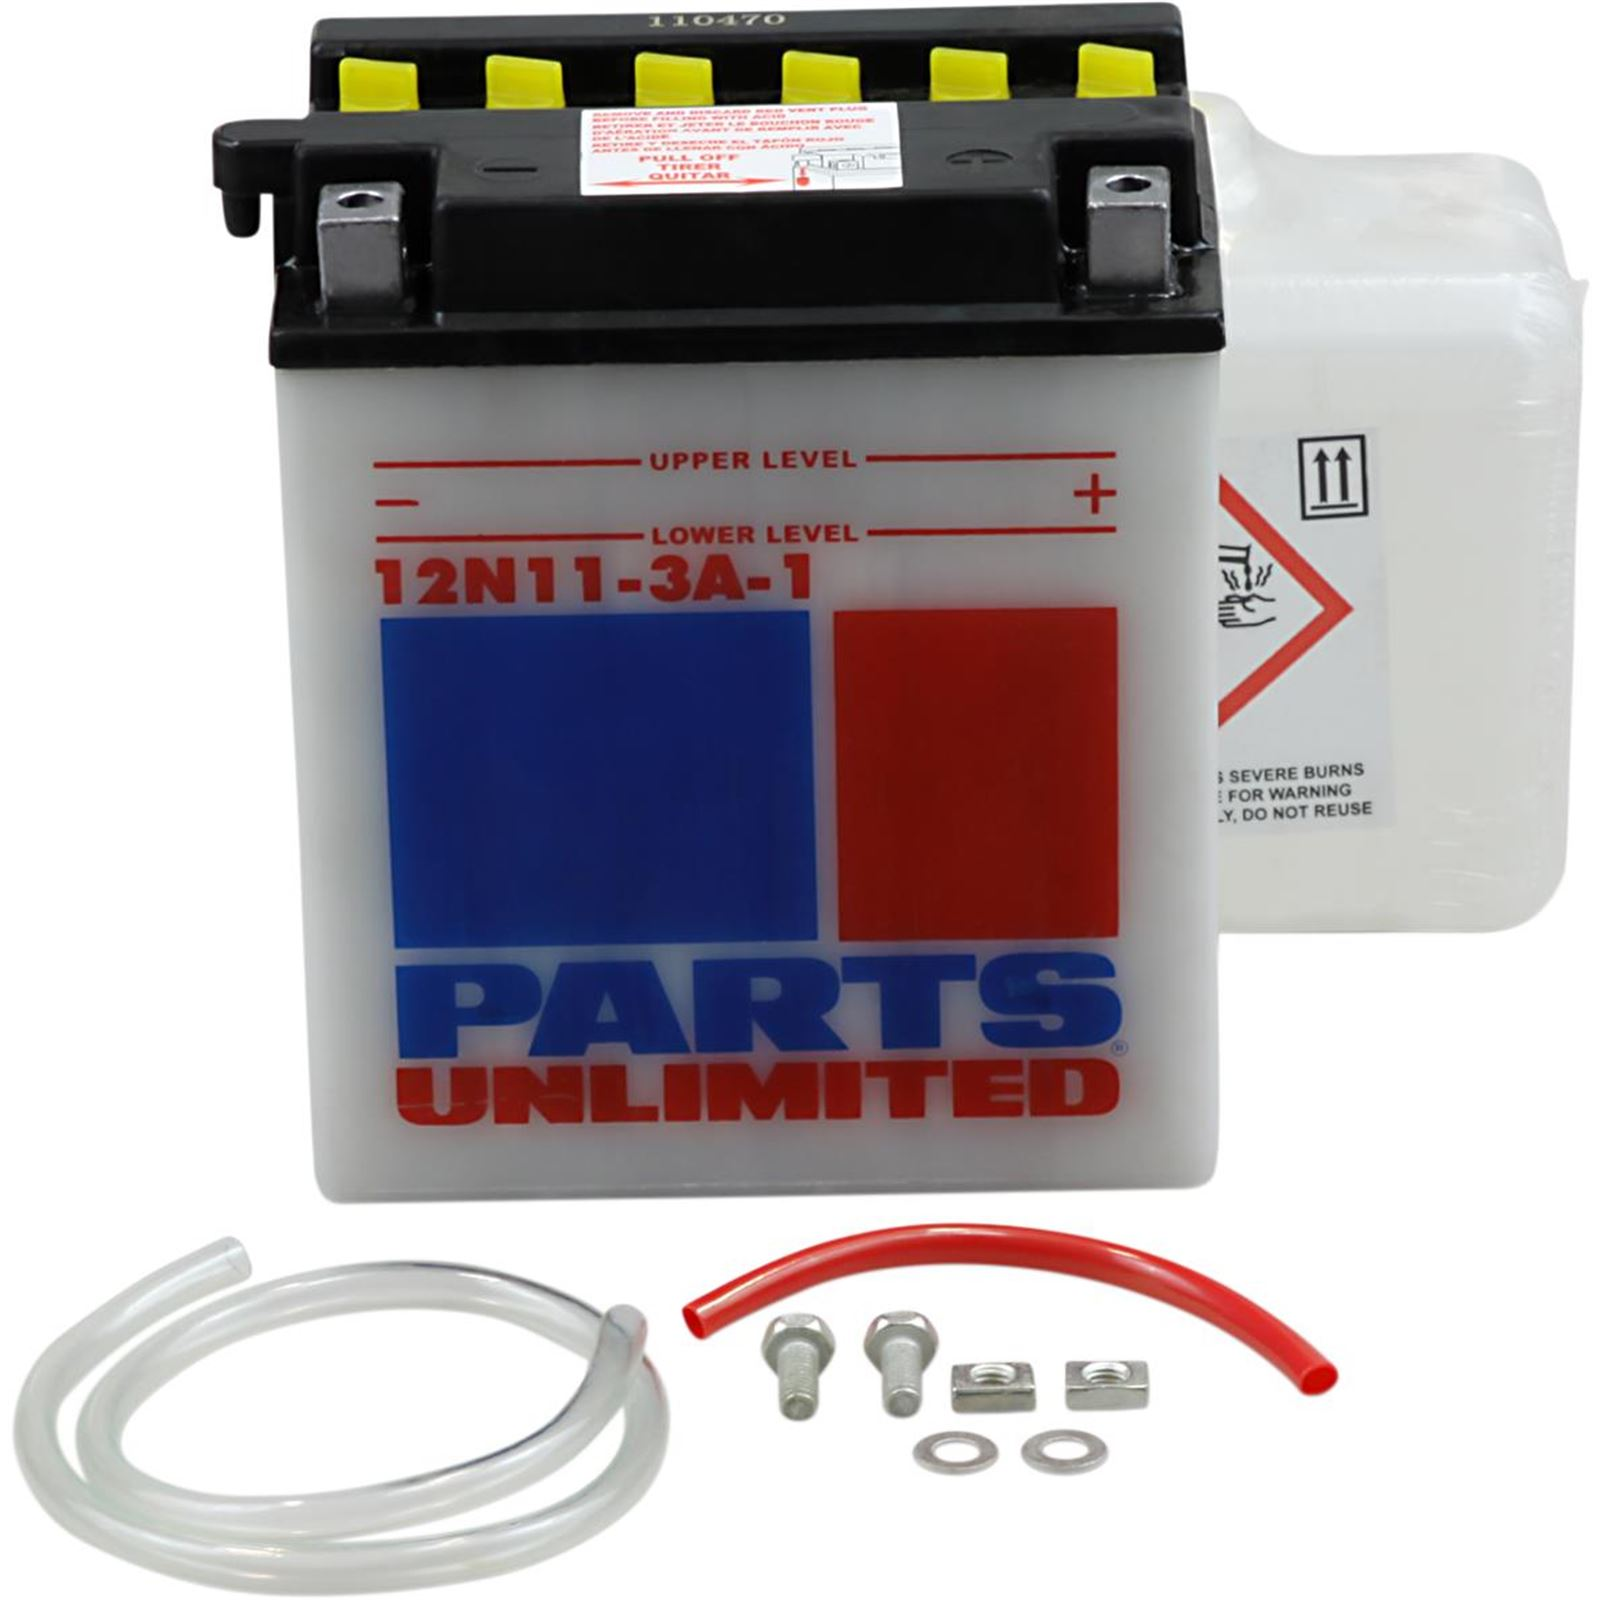 Moose Battery - 12N11-3A-1